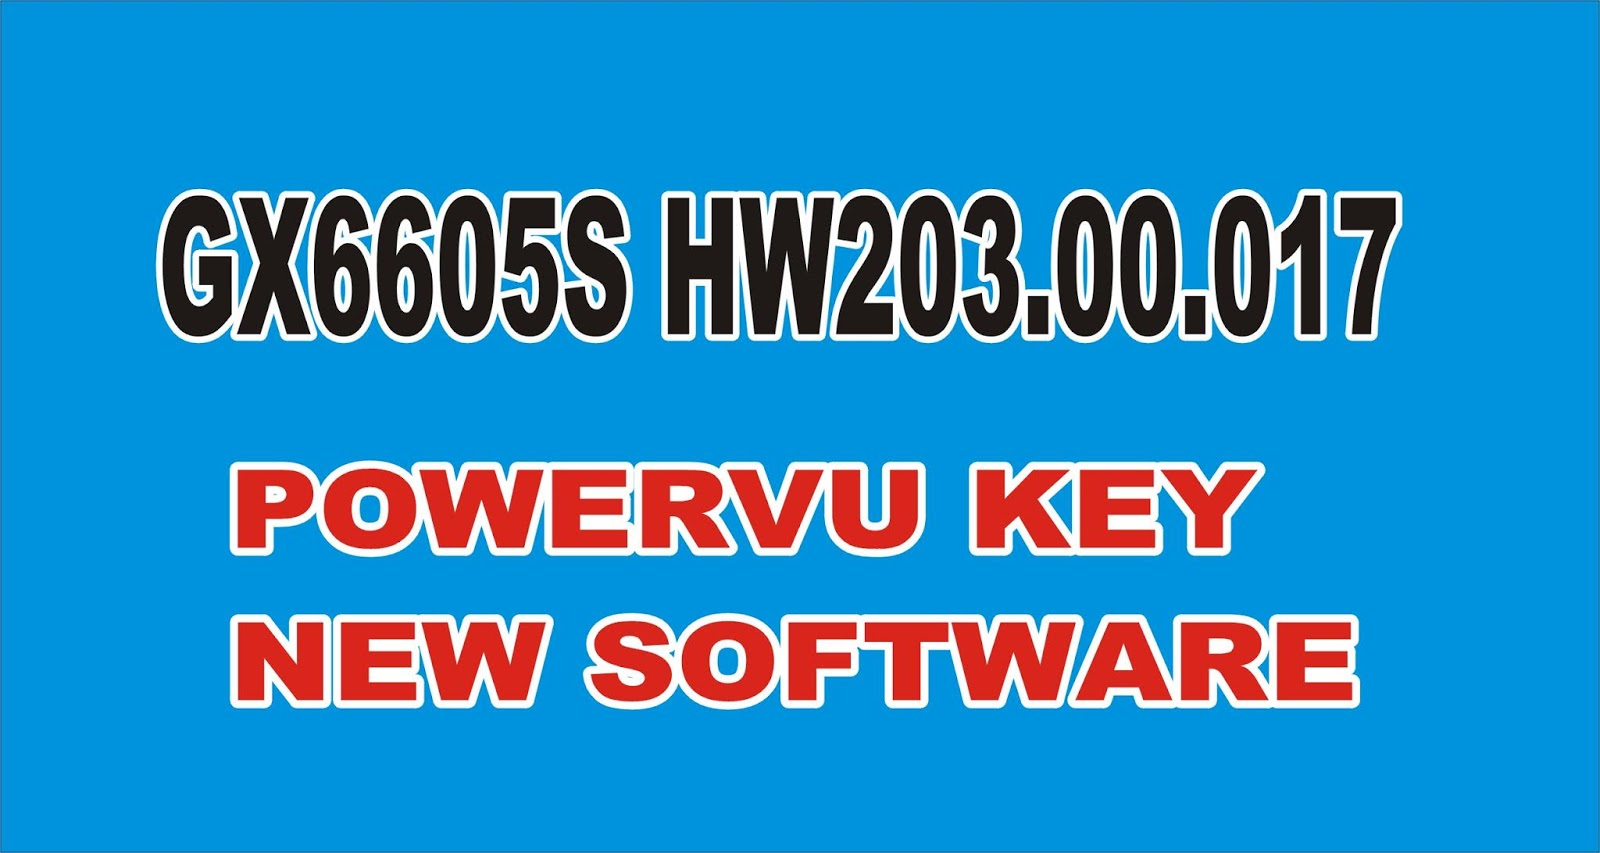 All Dish Receiver Software: GX6605S HW203 00 017 POWERVU KEY